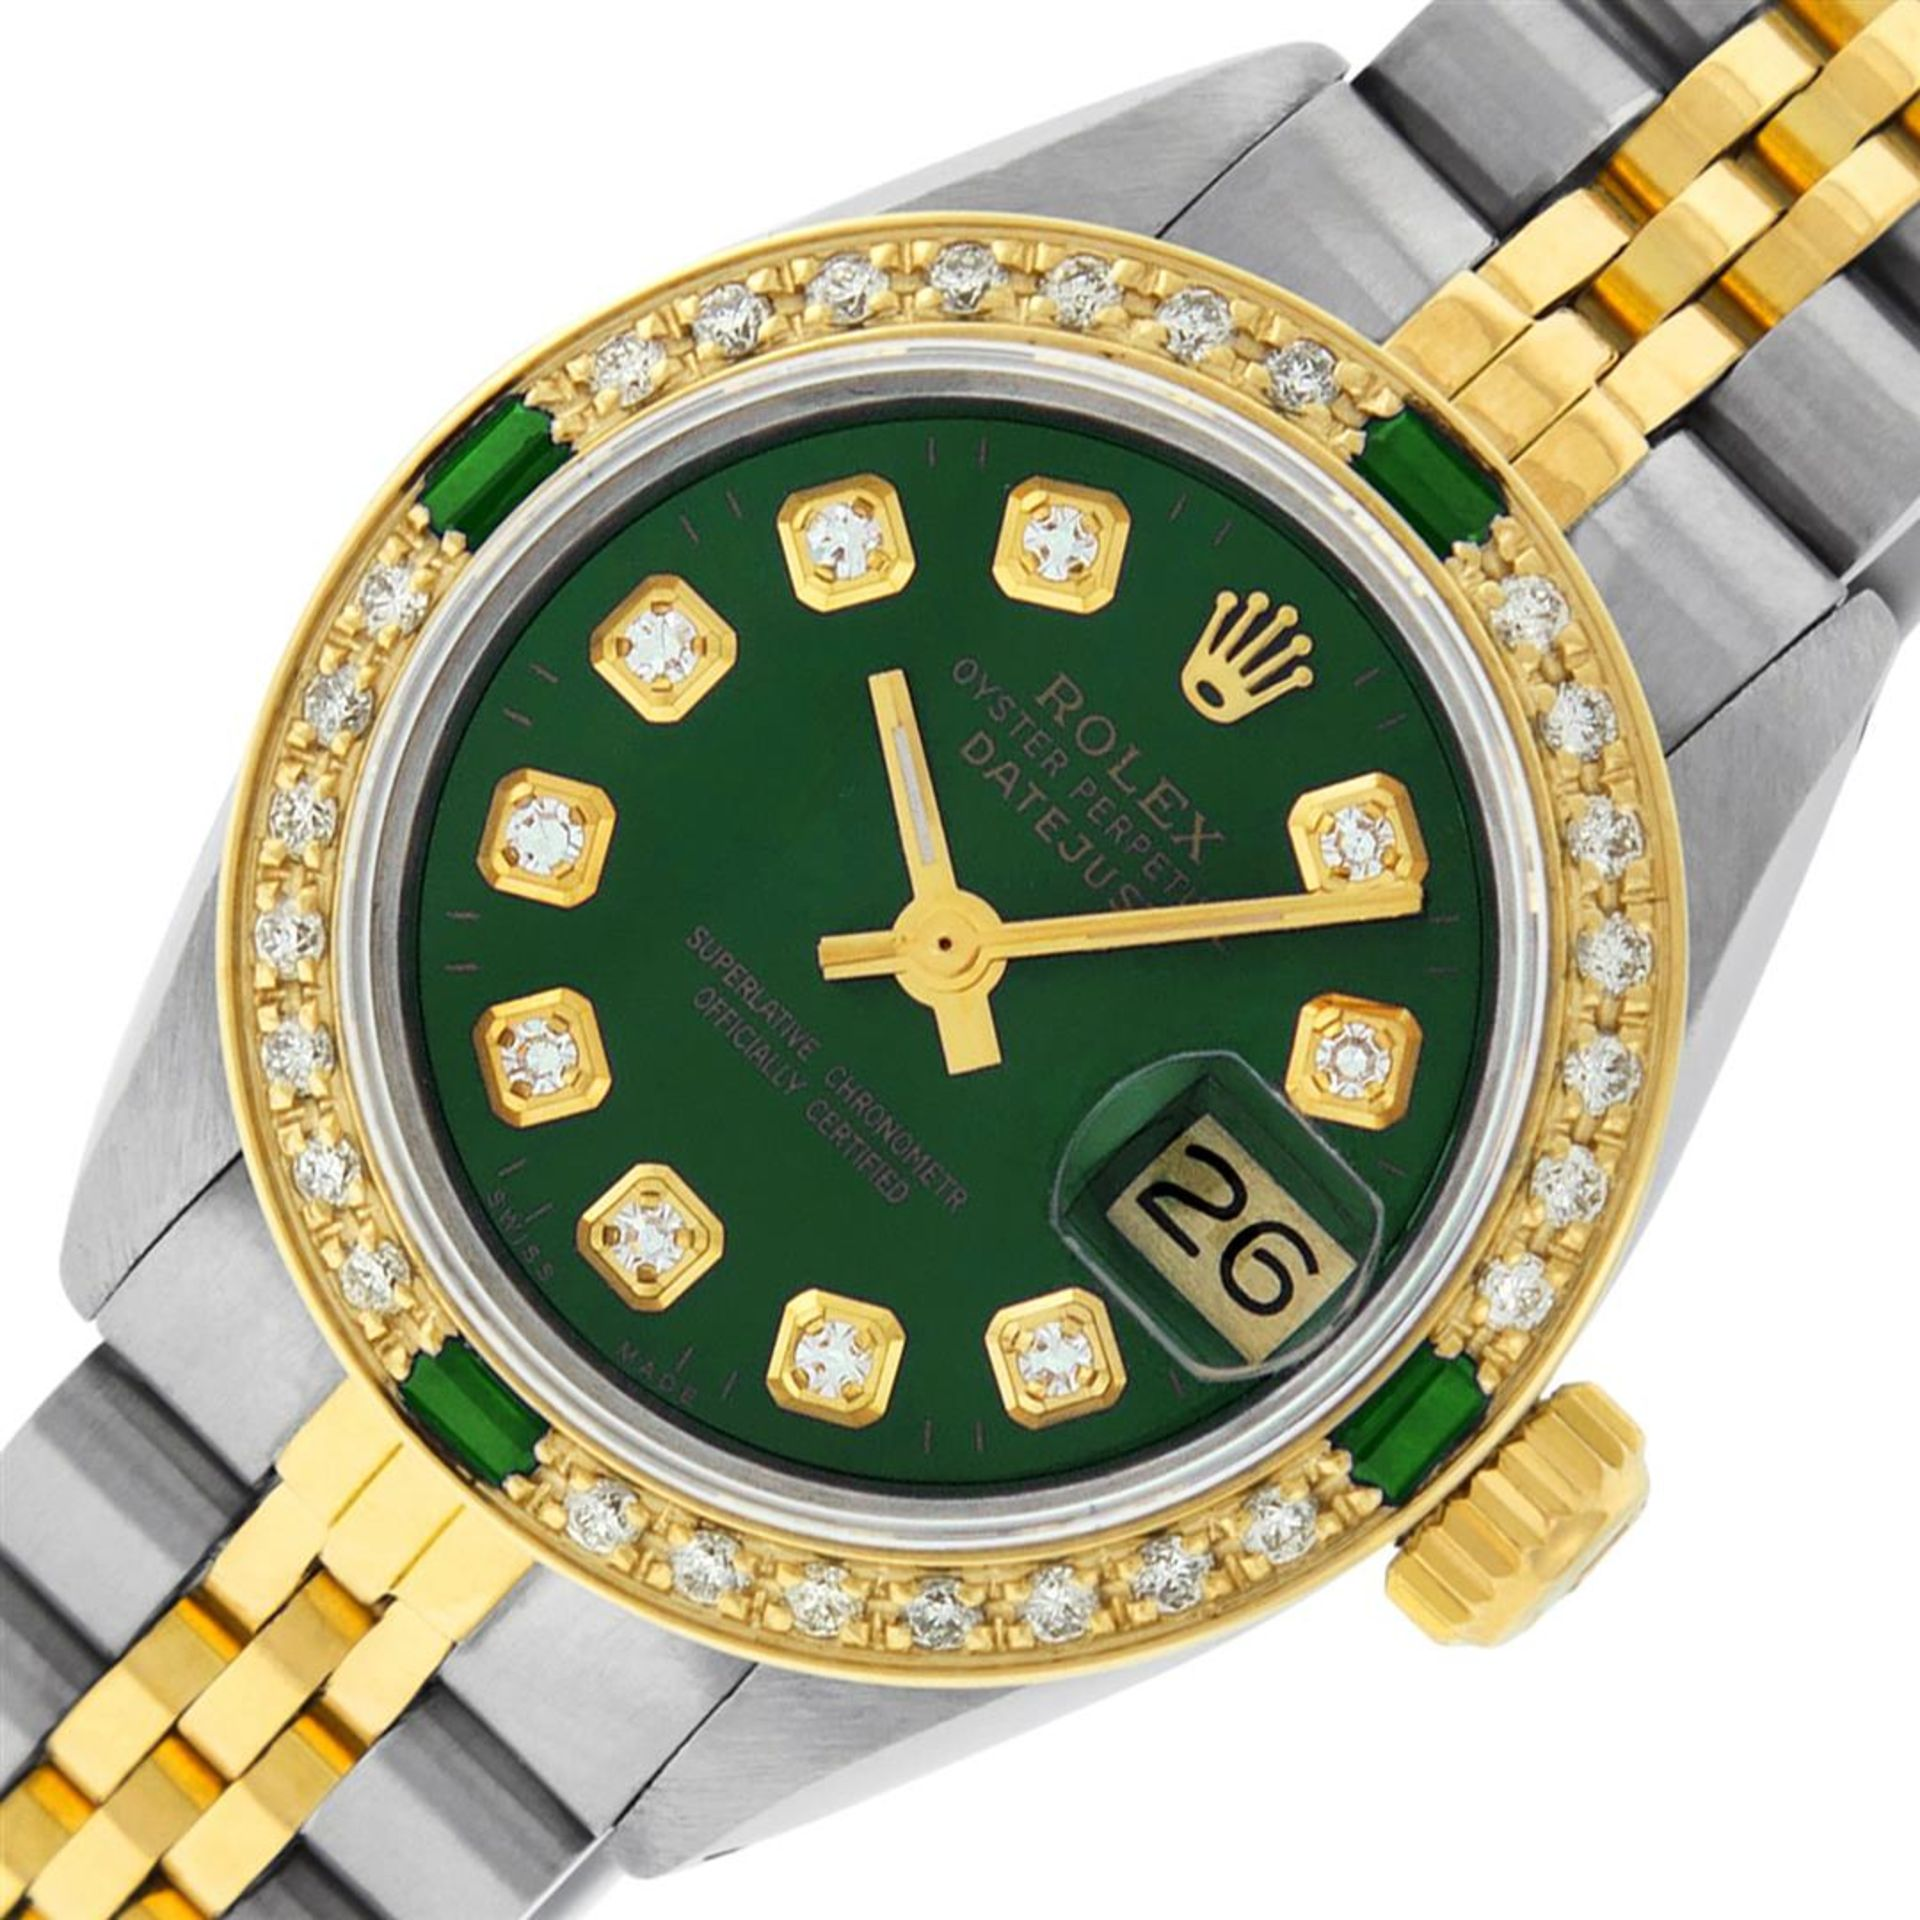 Rolex Ladies 2 Tone Green Diamond & Emerald Datejust Wristwatch - Image 2 of 9